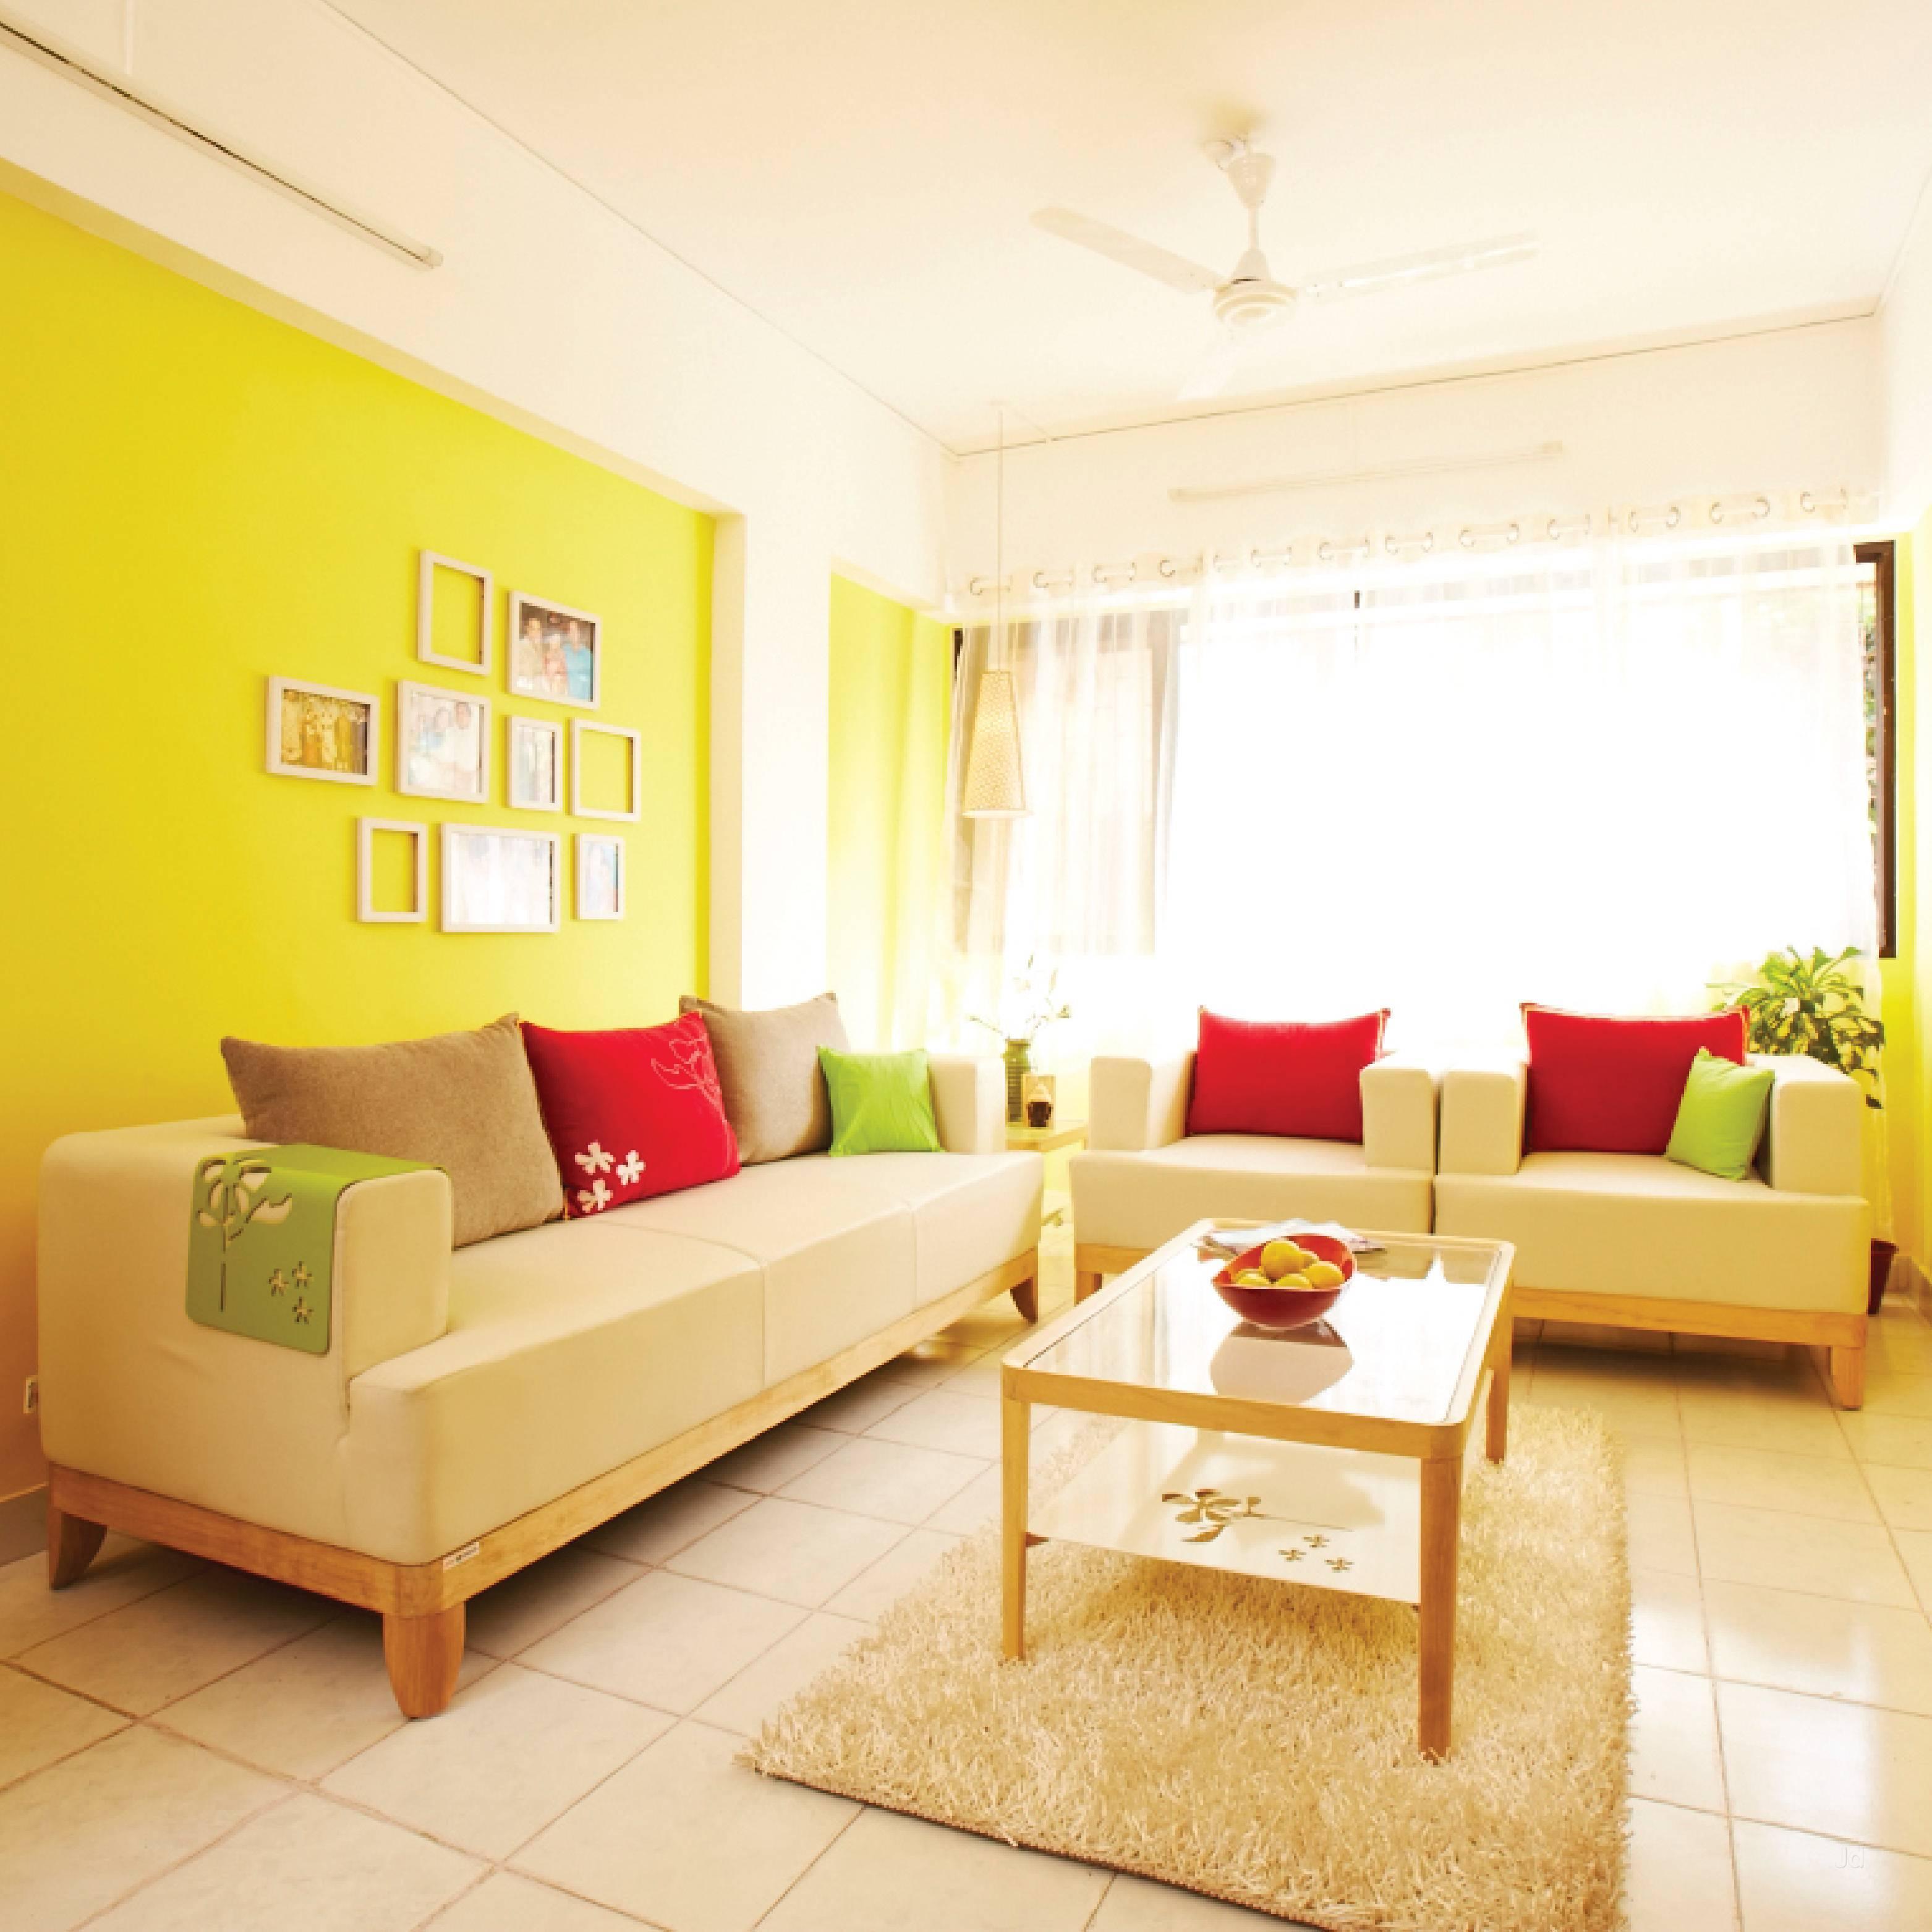 Prime Top 10 Sofa Dealers In Santacruz West Best Furniture Sofa Beatyapartments Chair Design Images Beatyapartmentscom